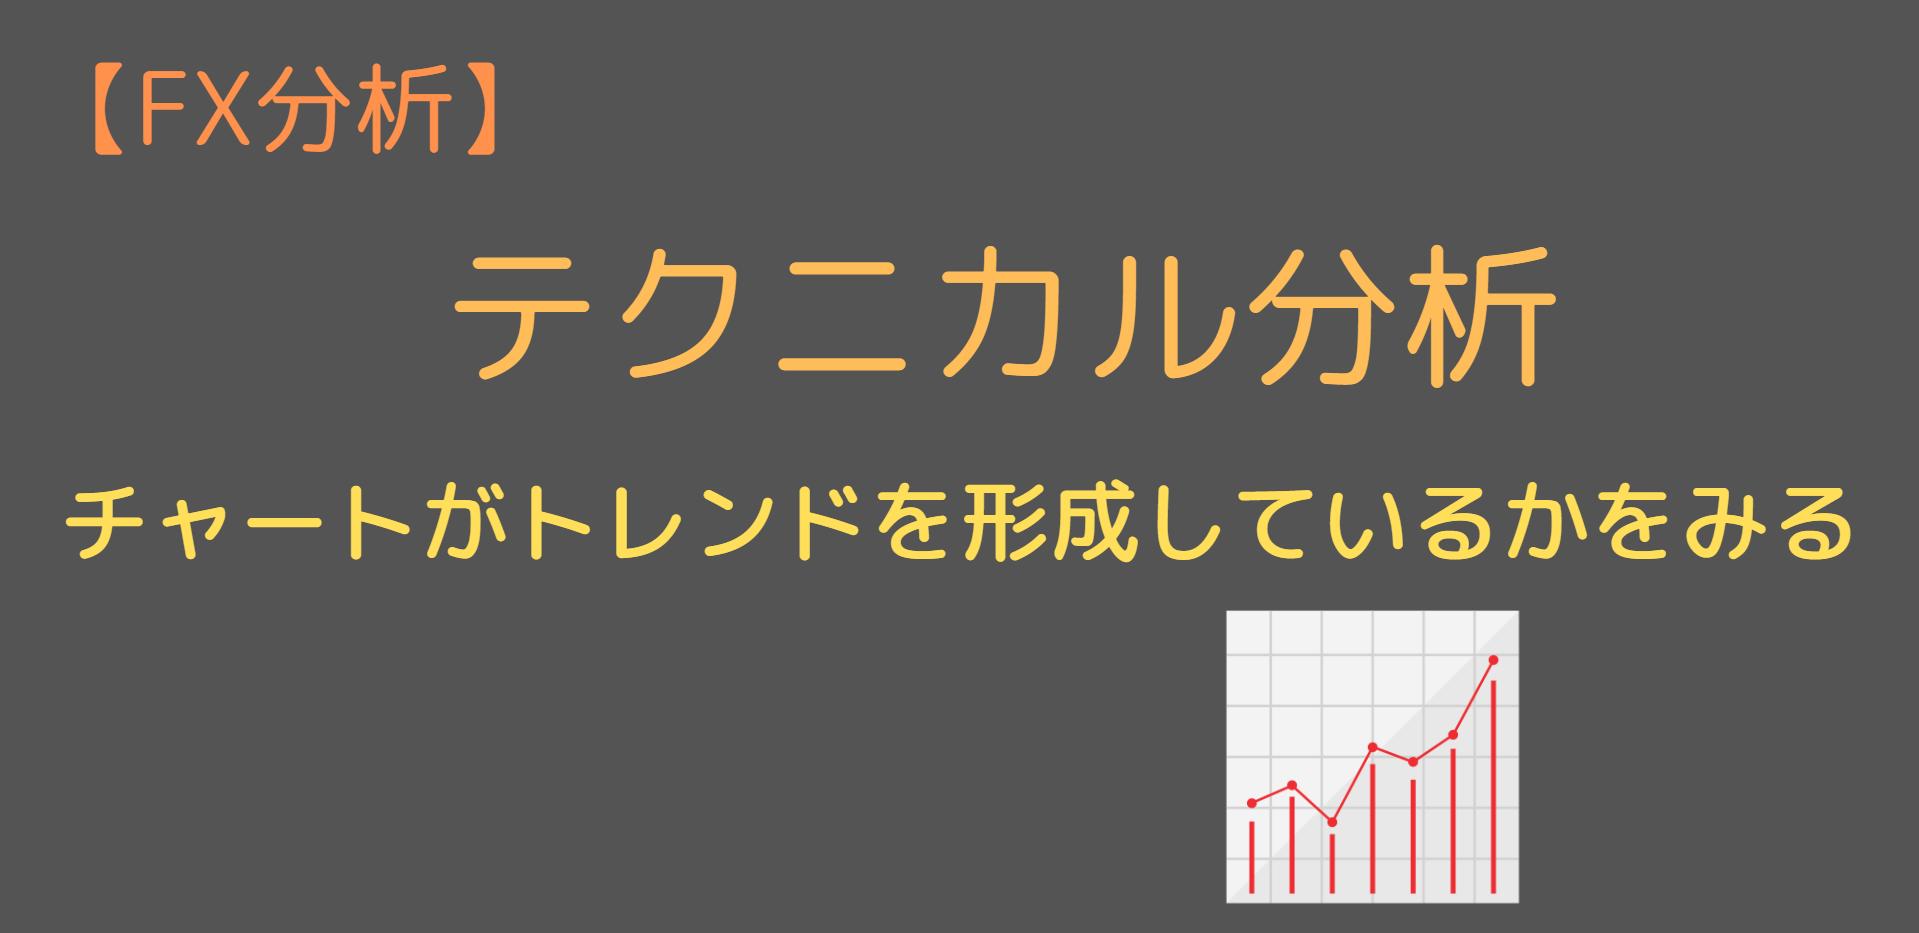 FX テクニカル分析